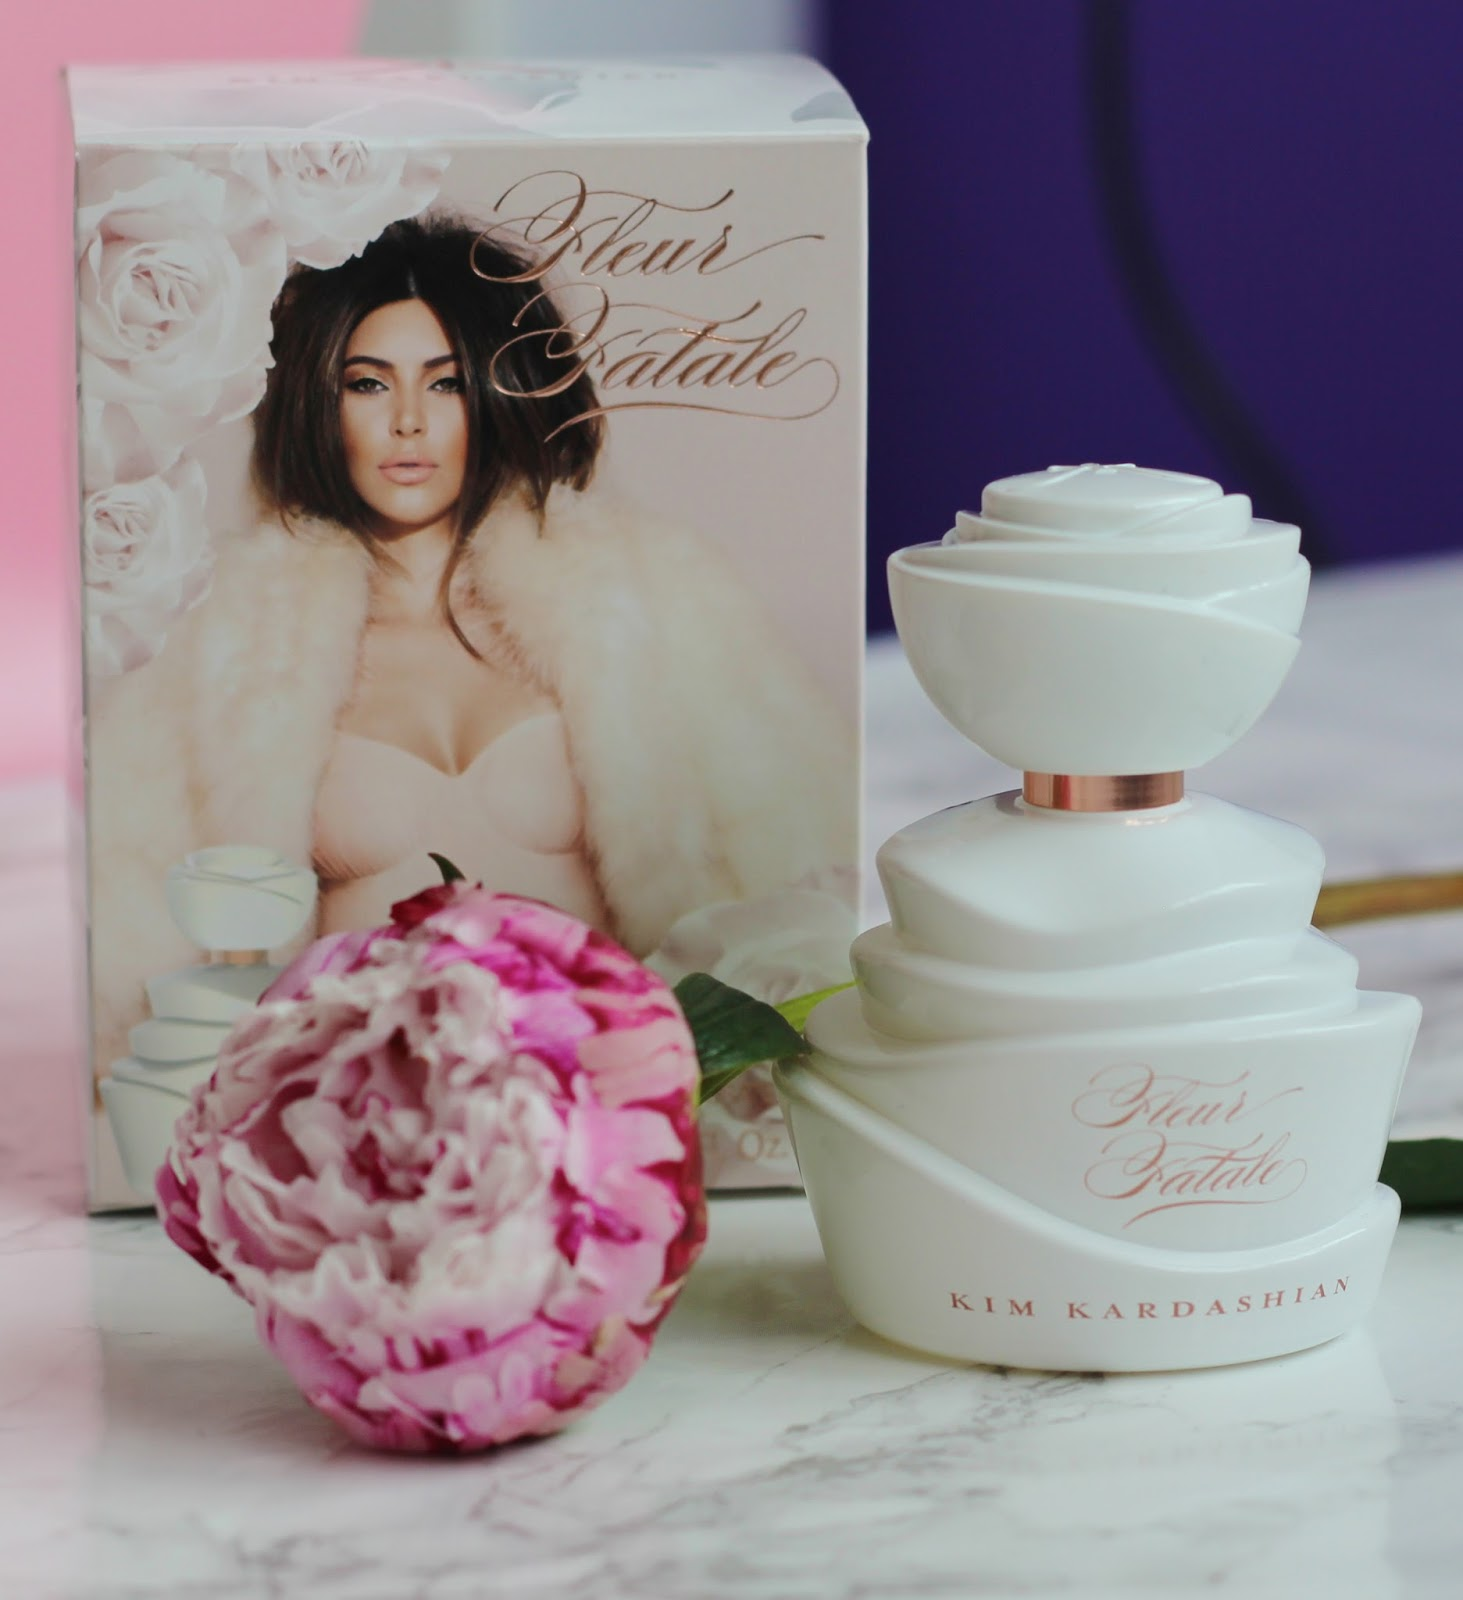 kim kardashian perfume - HD1463×1600